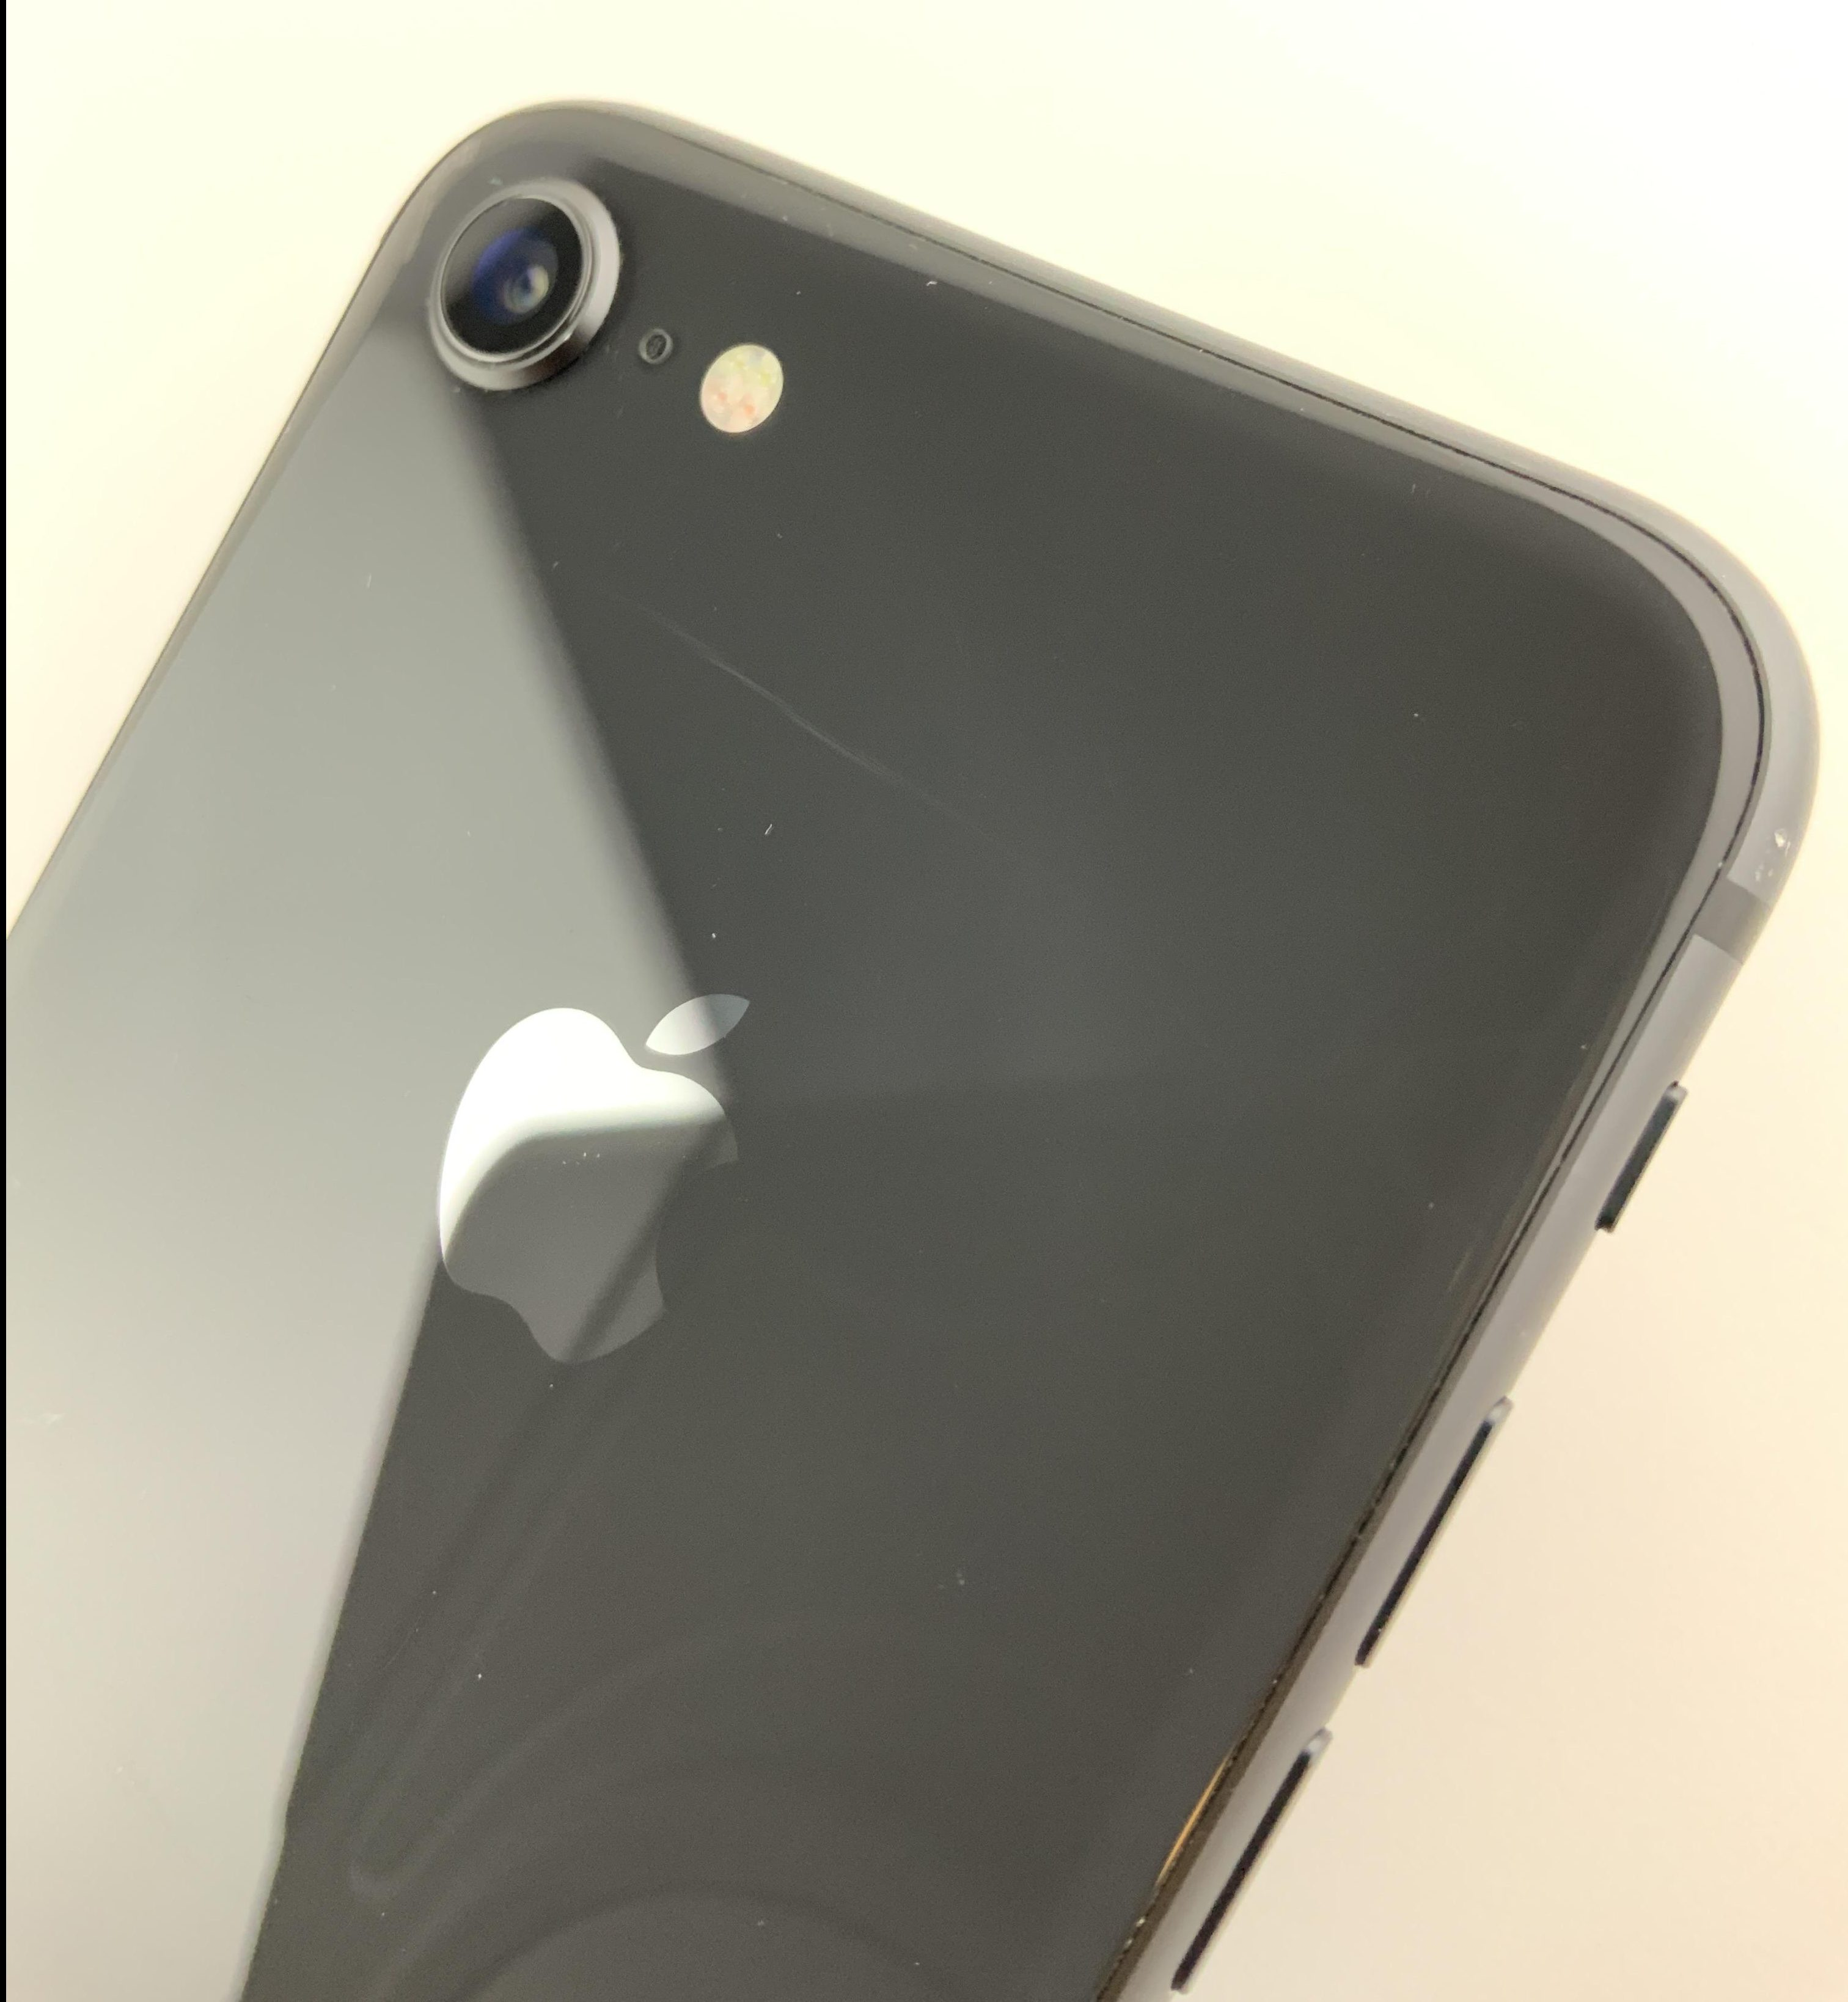 iPhone 8 128GB, 128GB, Space Gray, immagine 5